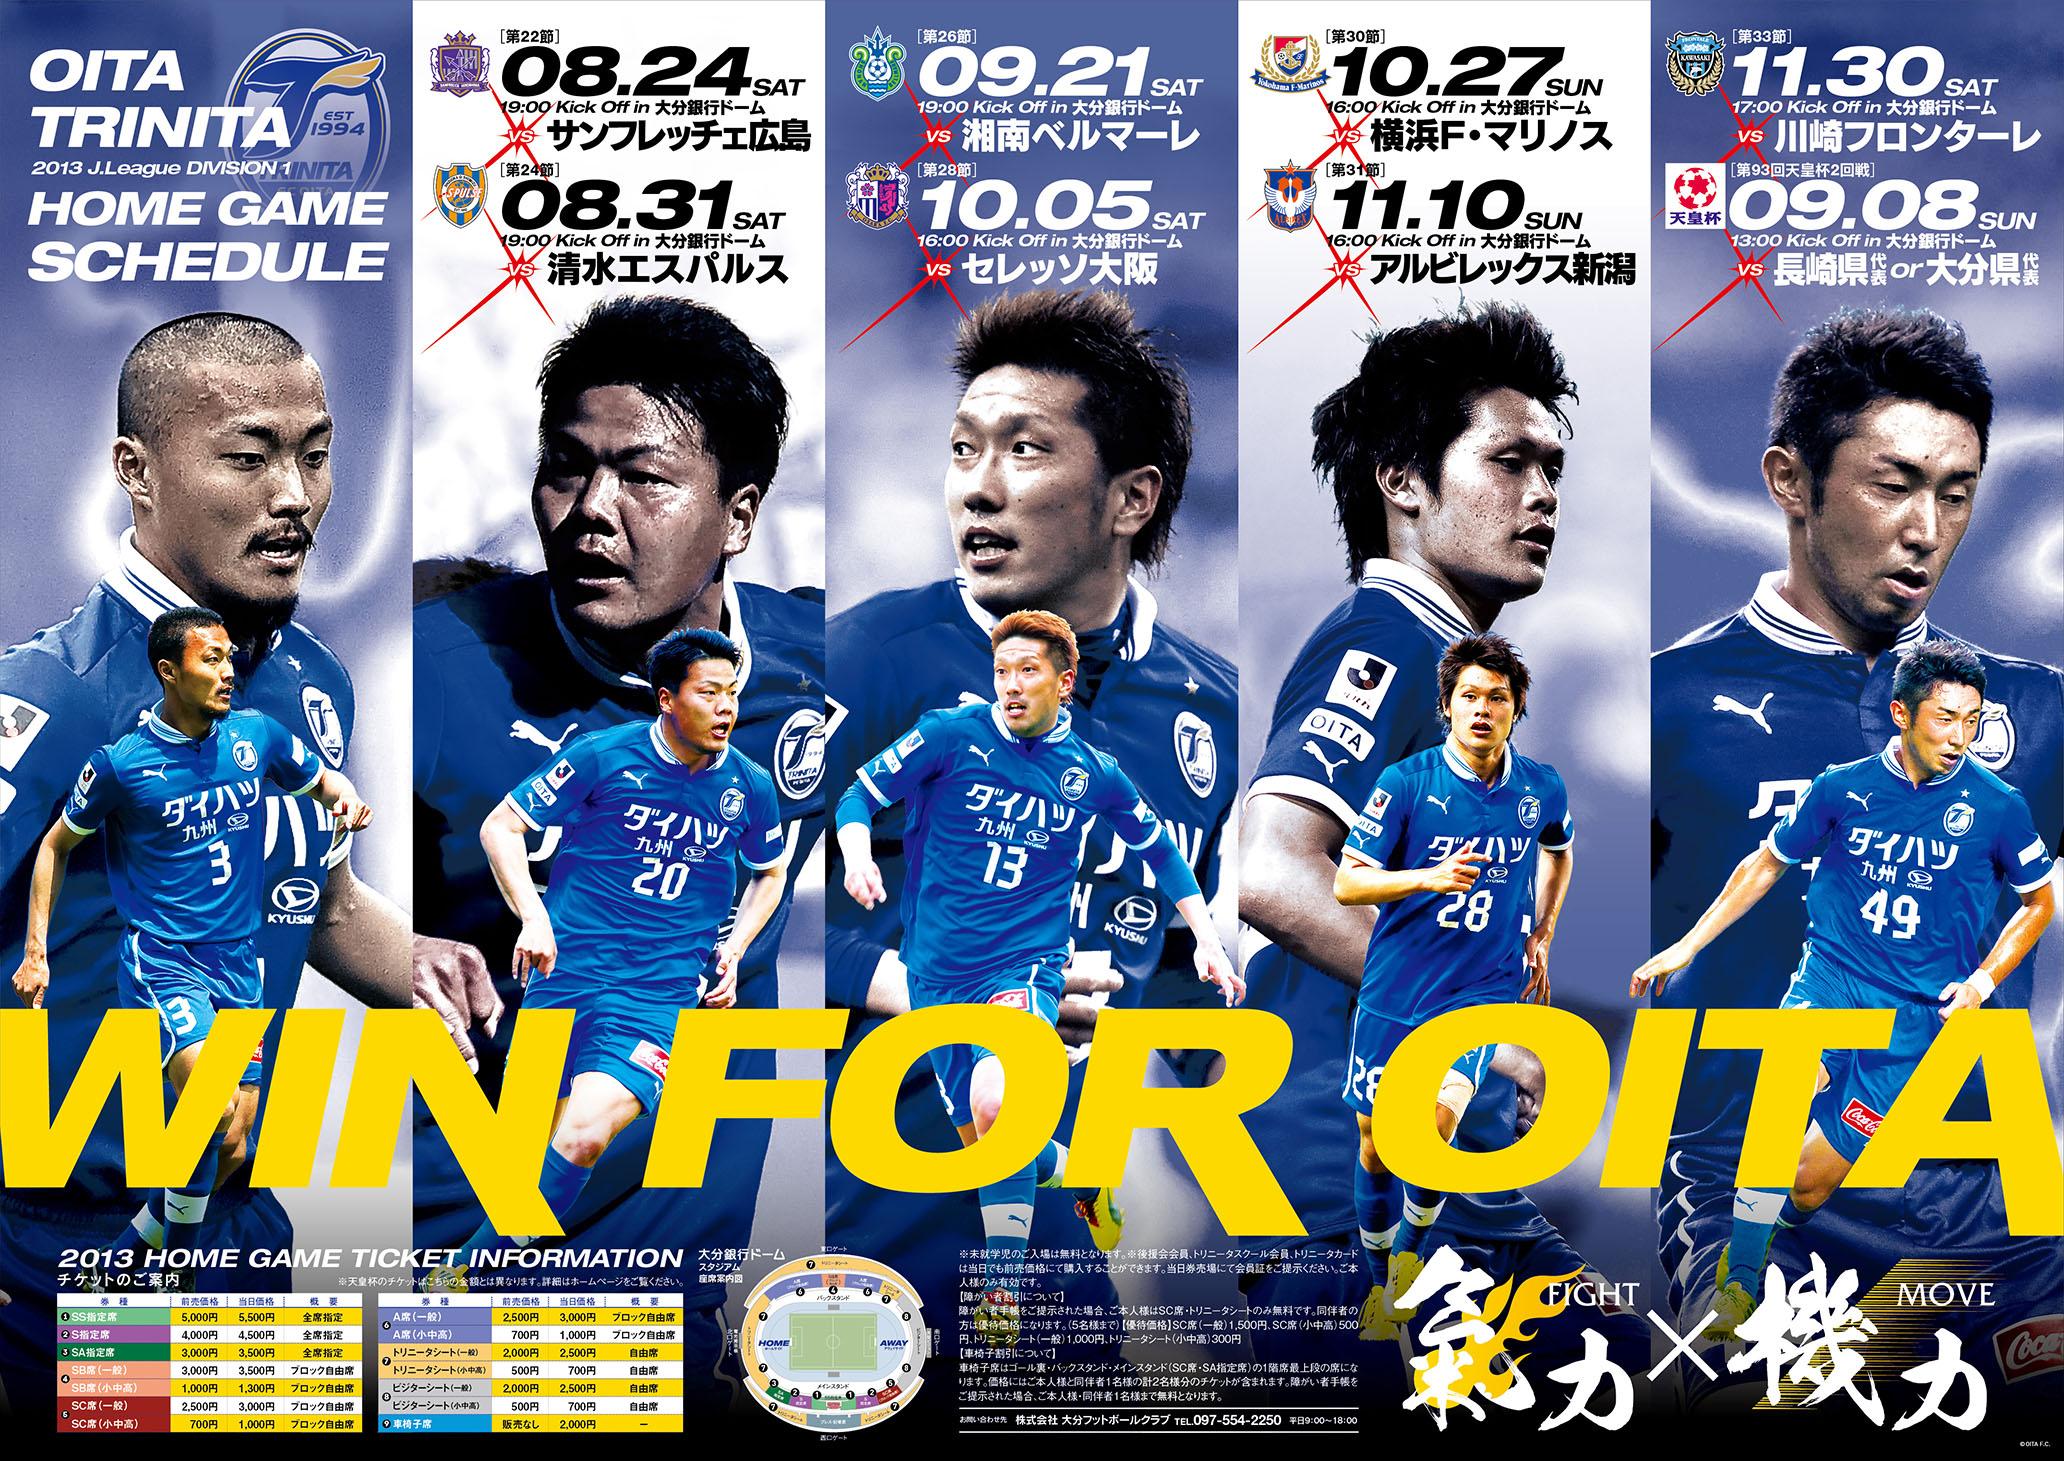 OITA TRINITA 2013後期試合日程ポスター